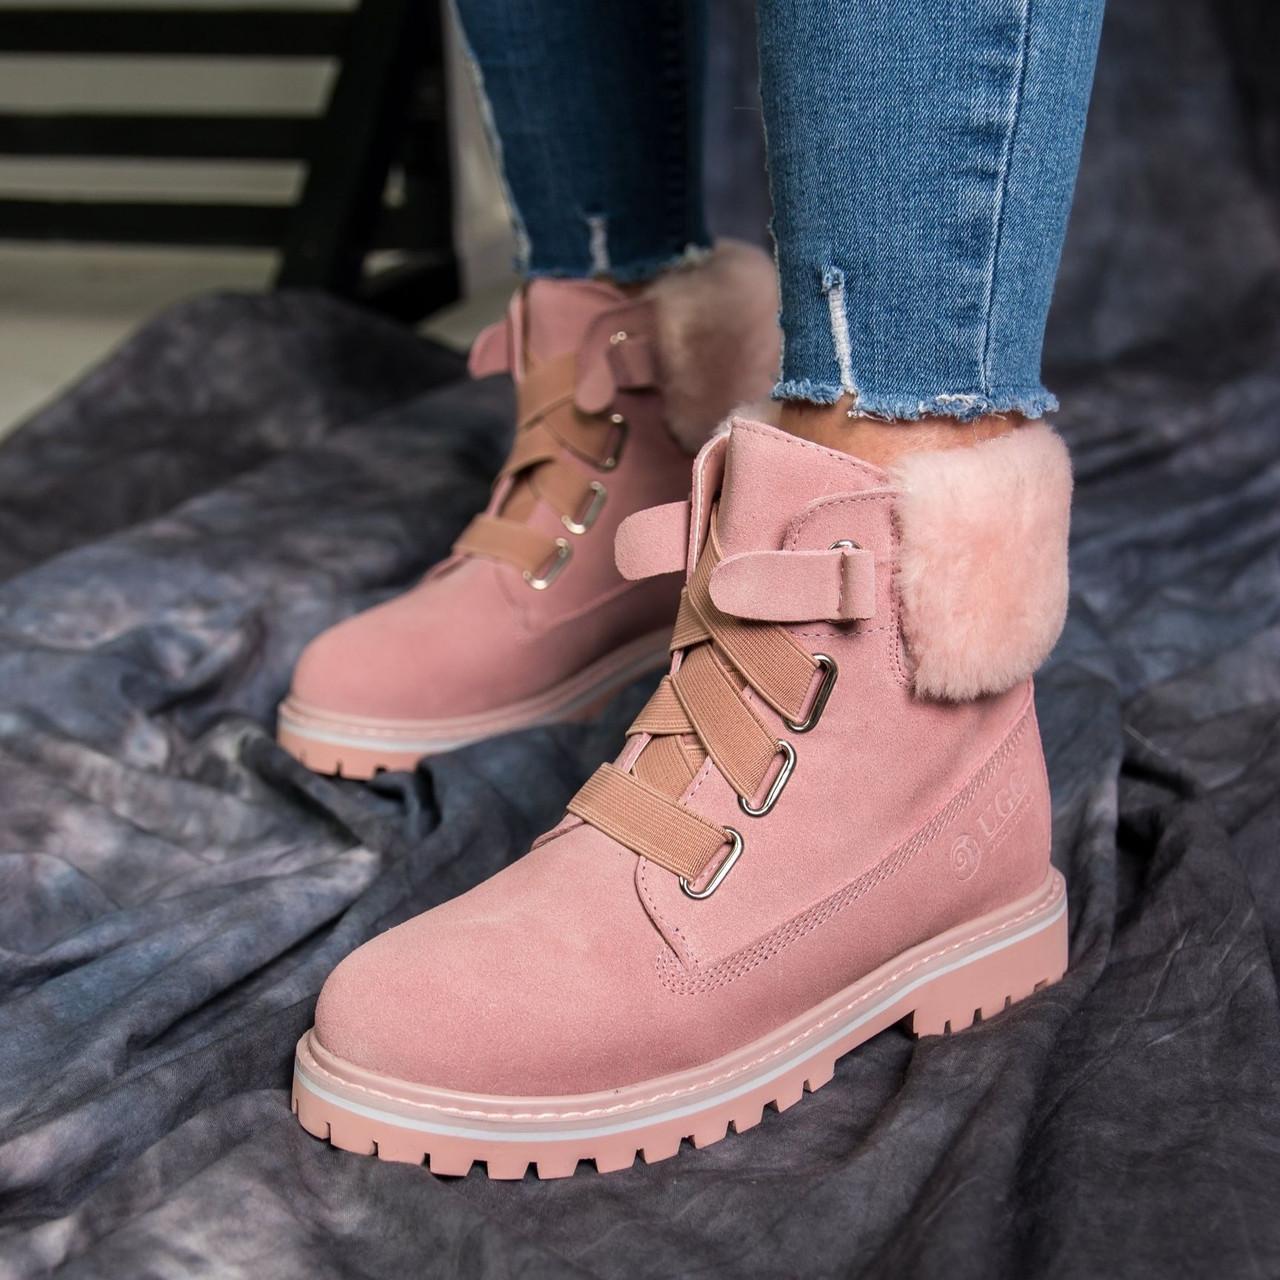 Зимние ботинки женские в стиле UGG Australia